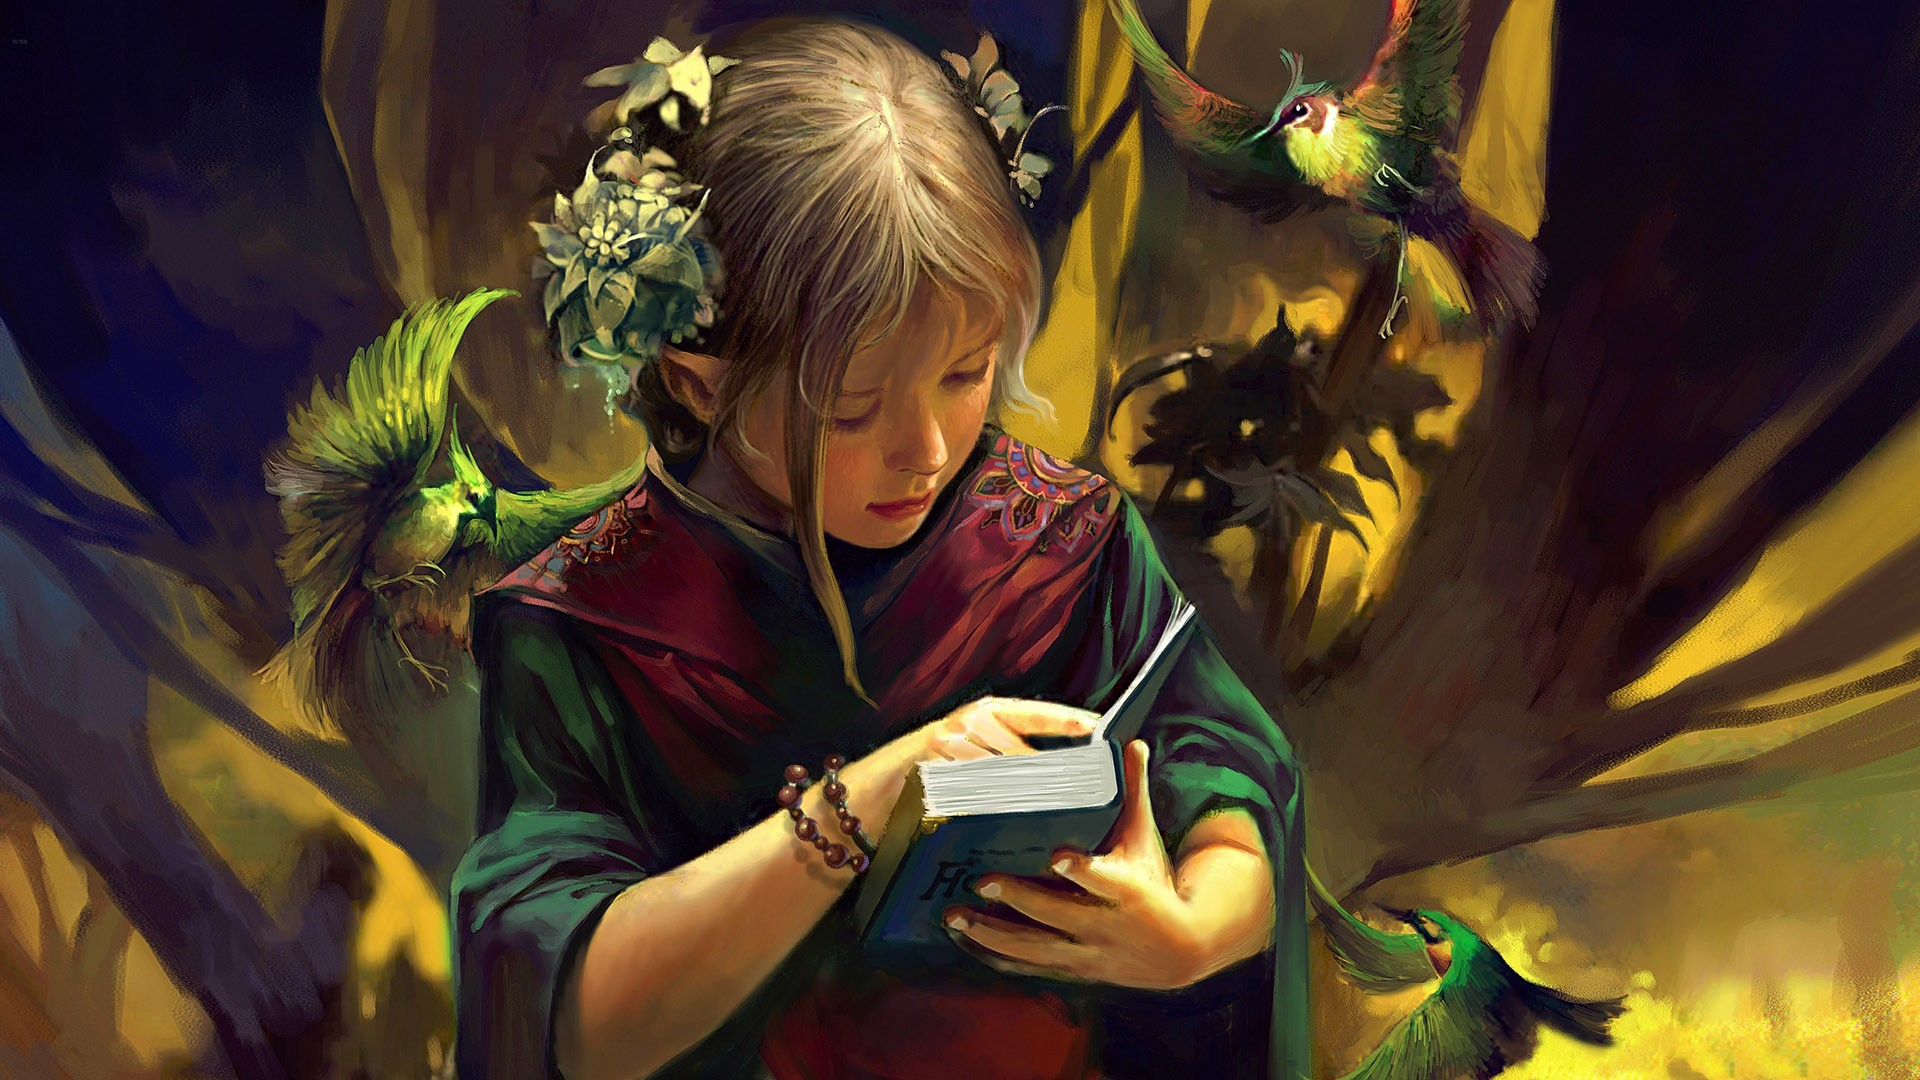 Фэнтези - Эльф  - Elven - ребенок - Книга - Птица Обои